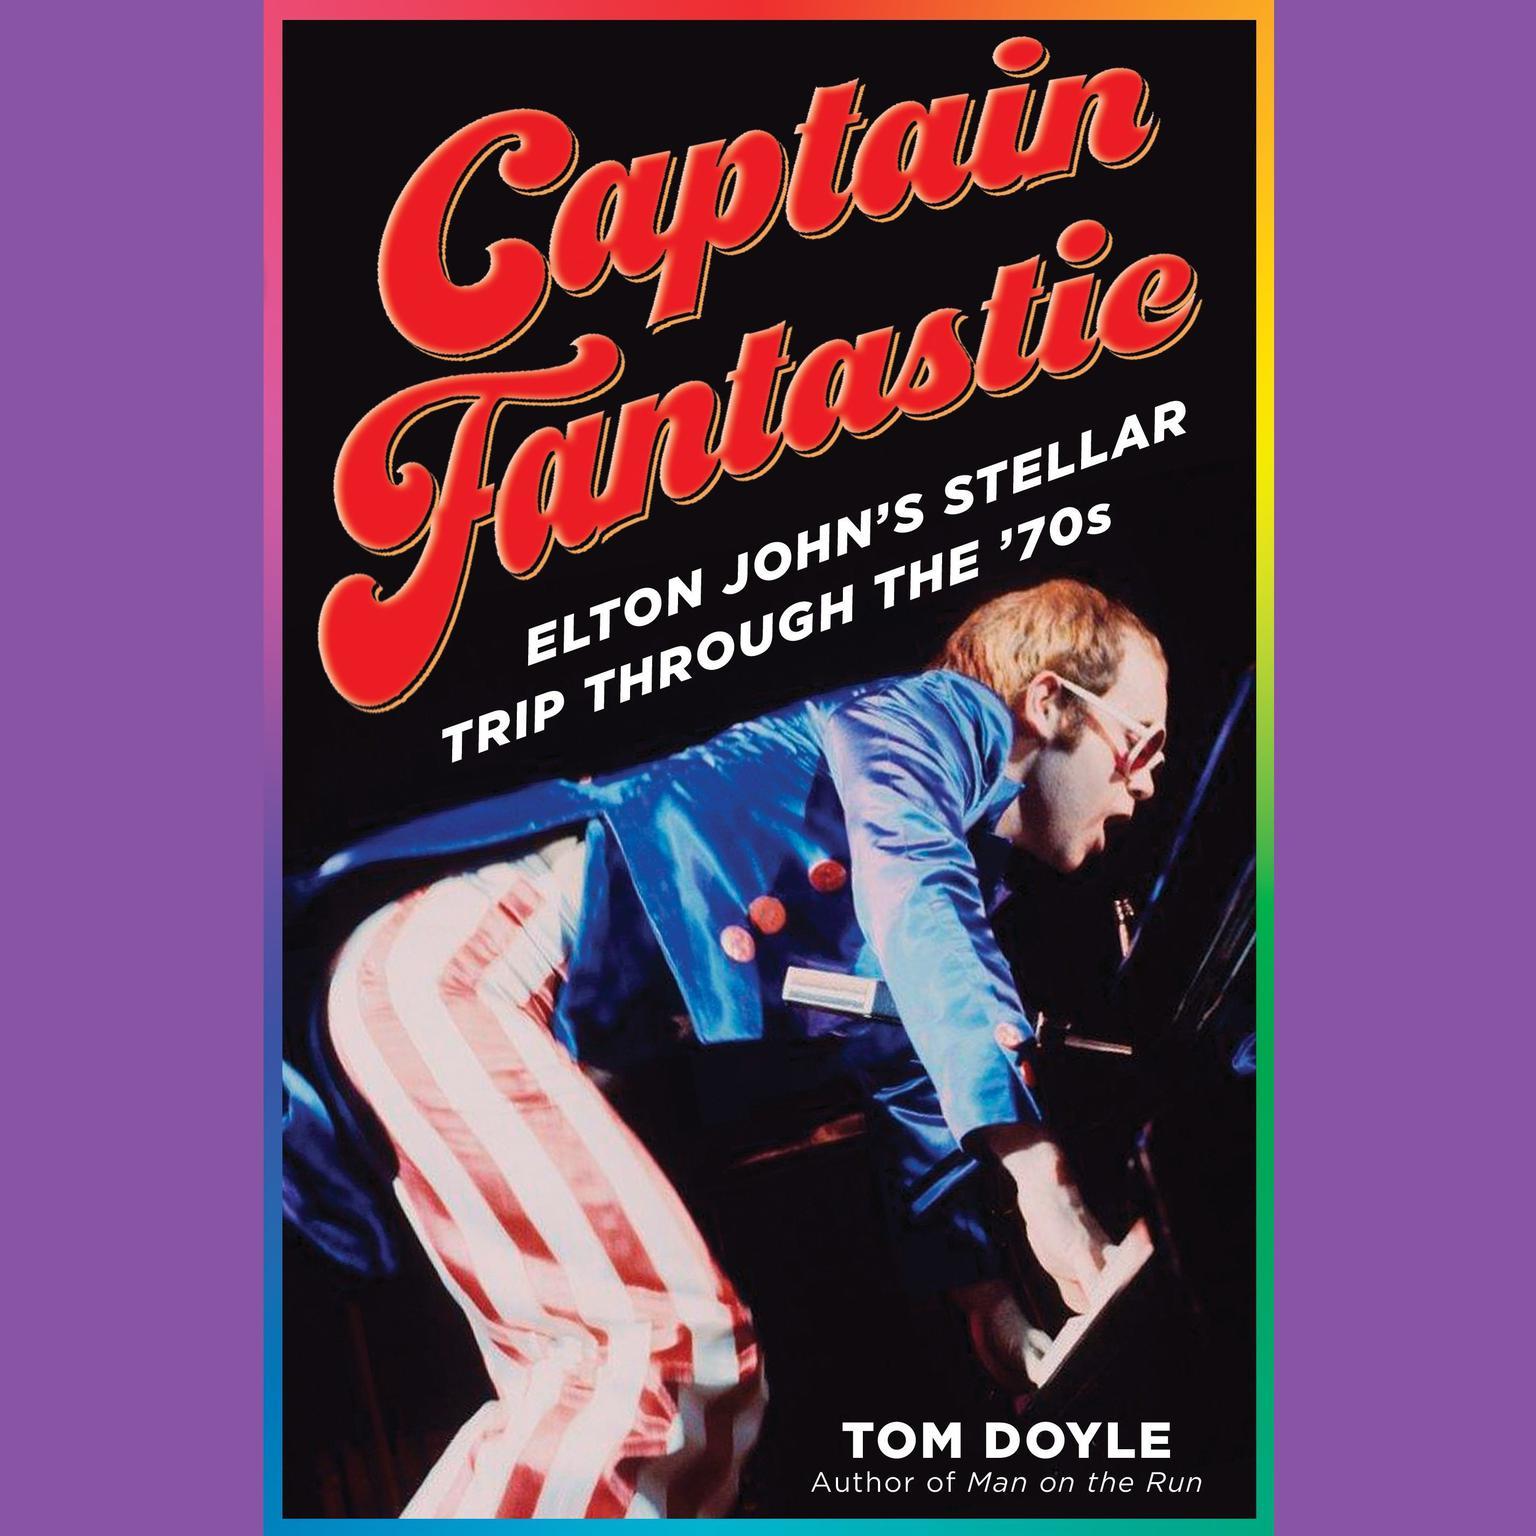 Printable Captain Fantastic: Elton John's Stellar Trip Through the '70s Audiobook Cover Art